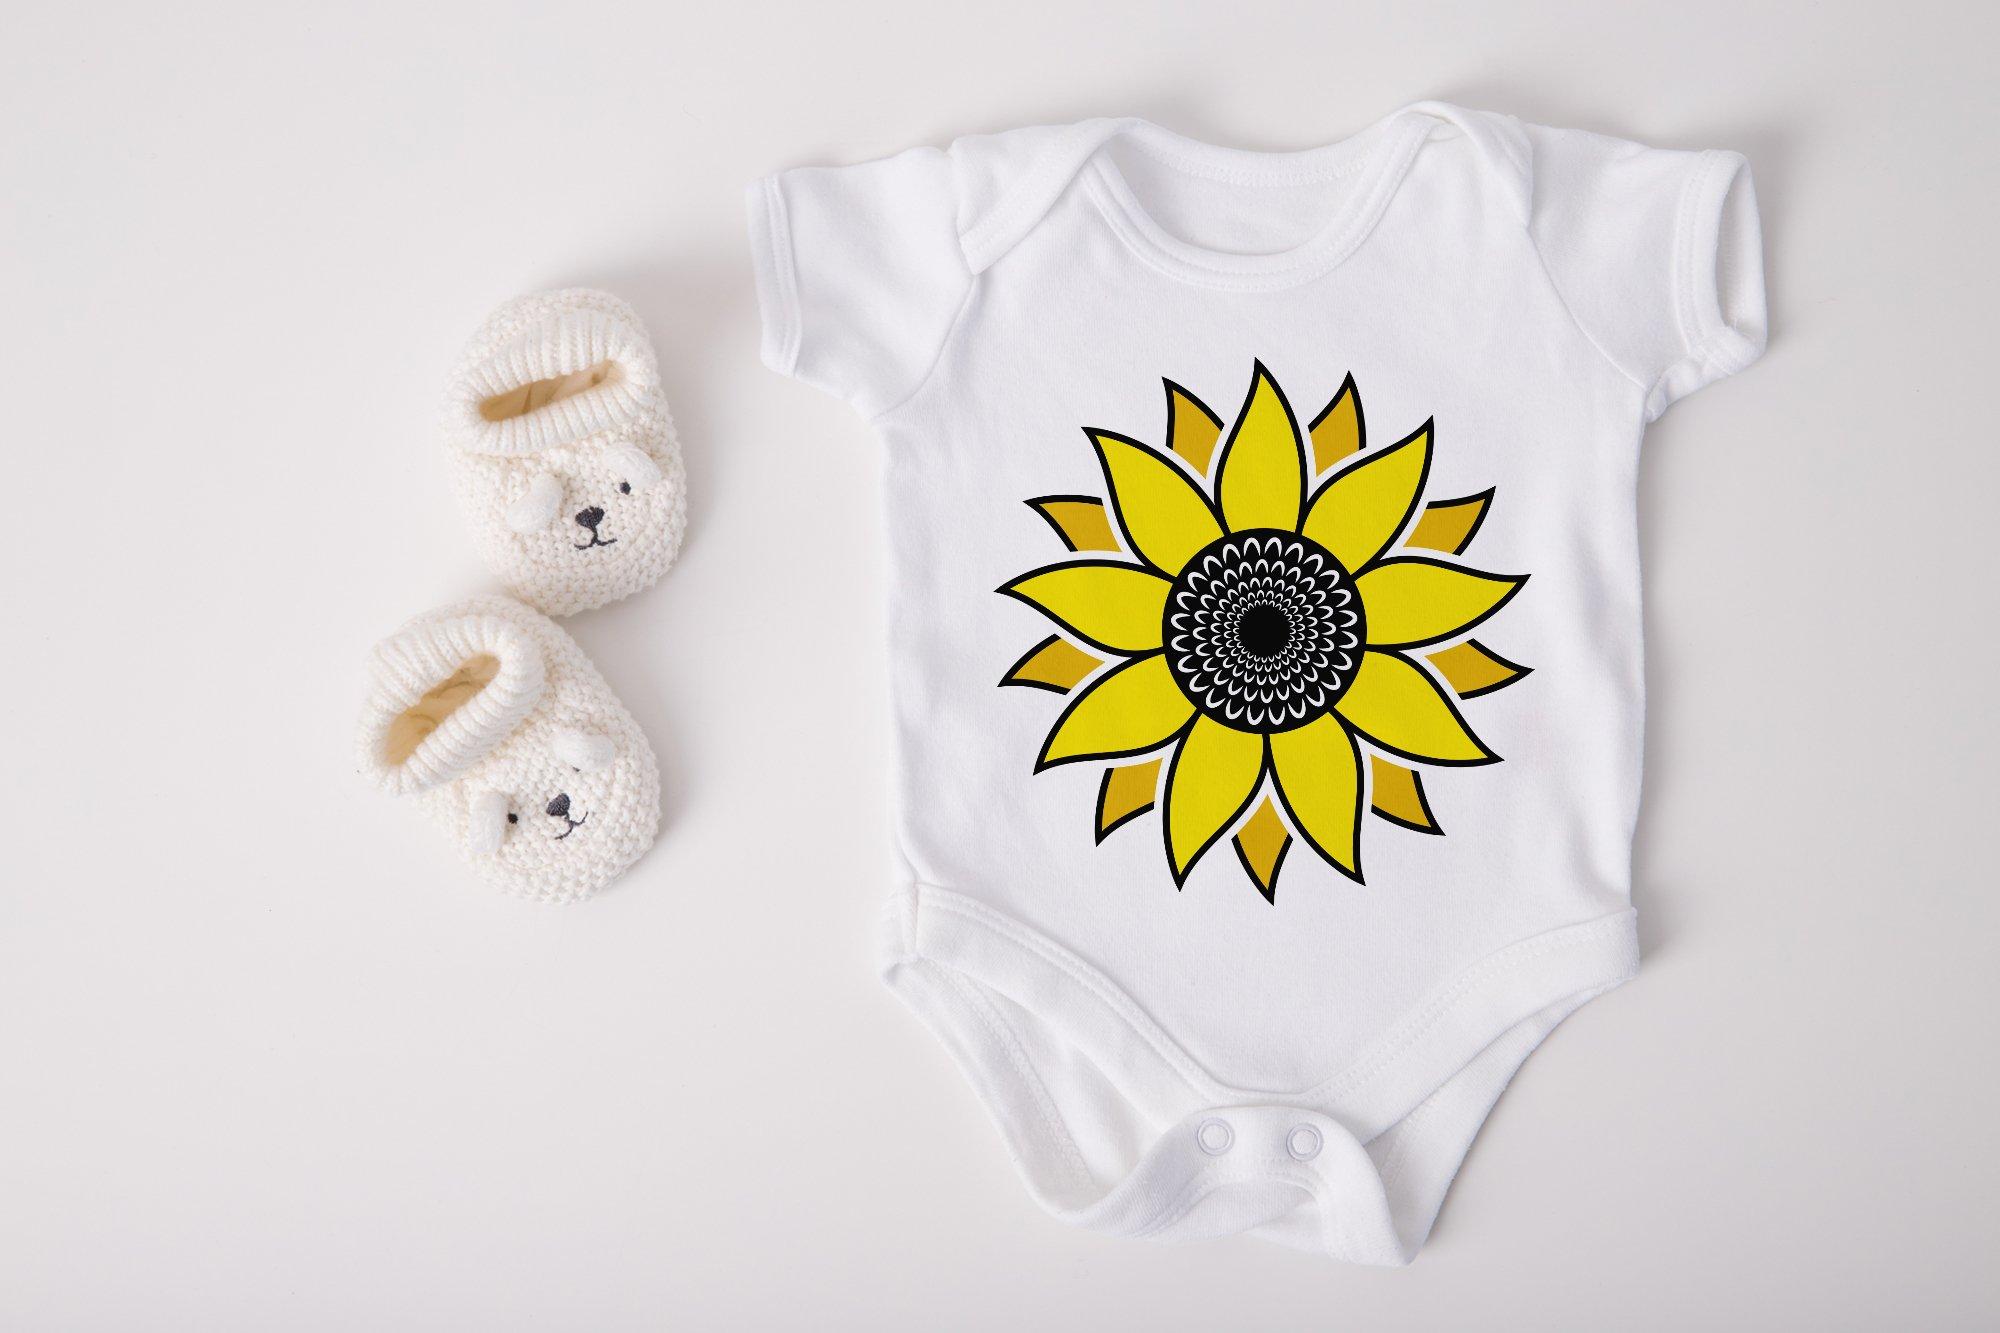 Sunflower SVG, Sunflower Clipart, Sunflower Monogram SVG example image 3